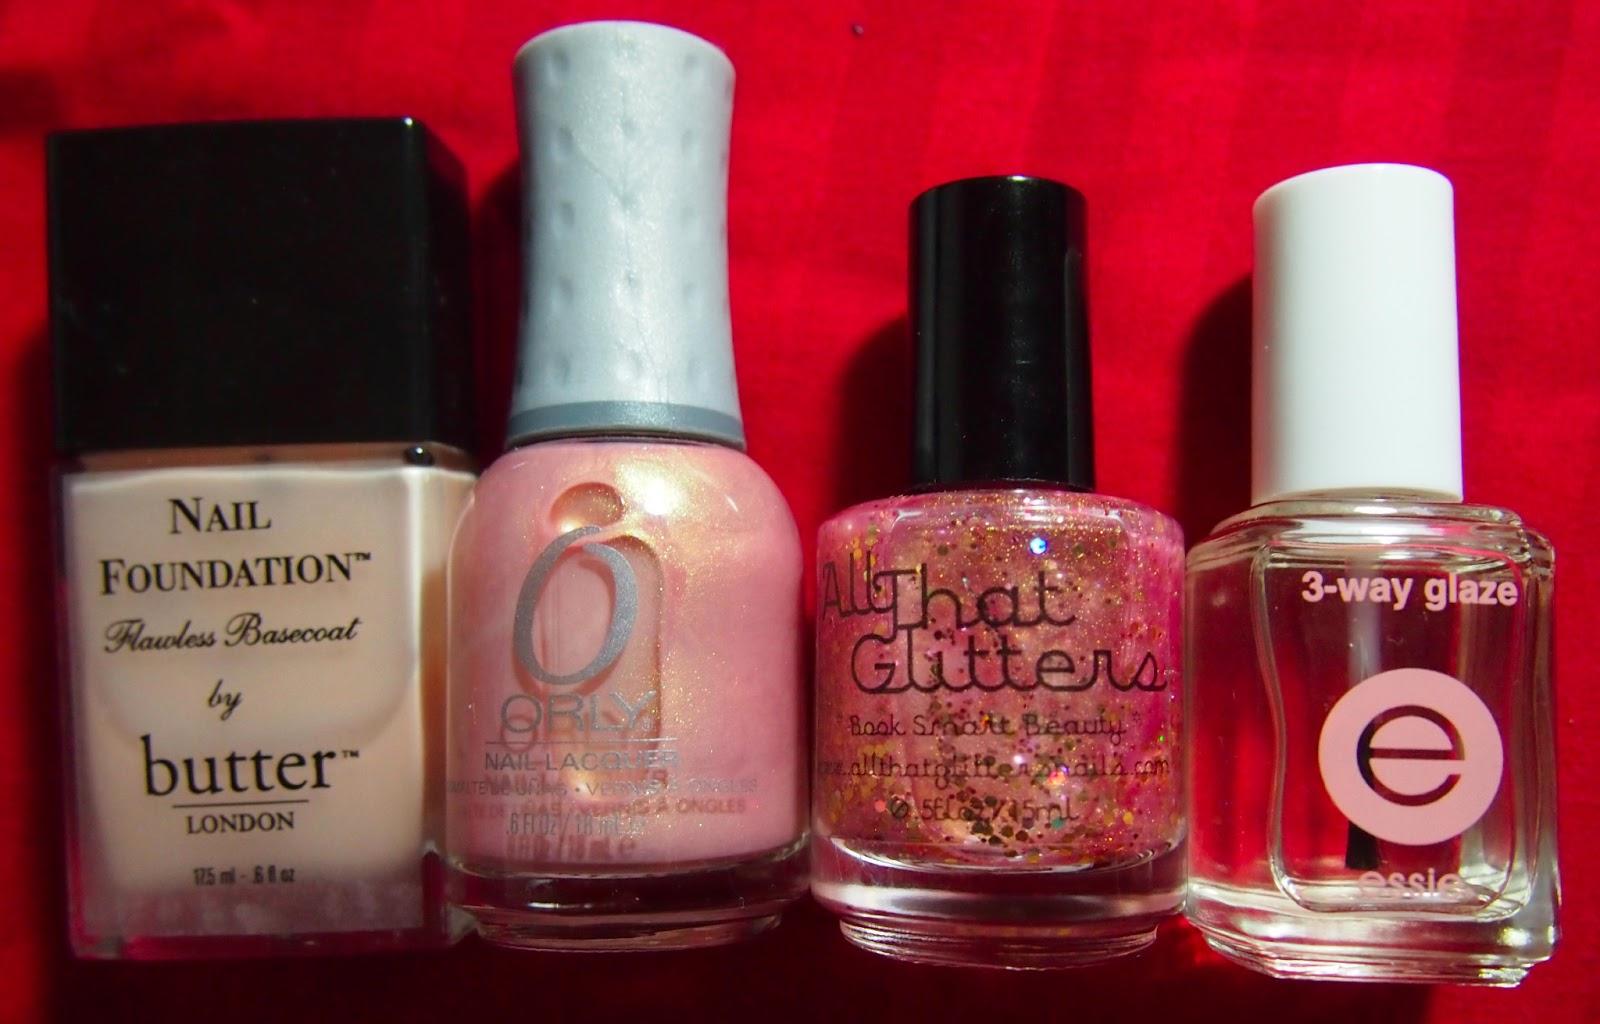 Shrinking Wallet: NOTD: All That Glitters - Book Smart Beauty